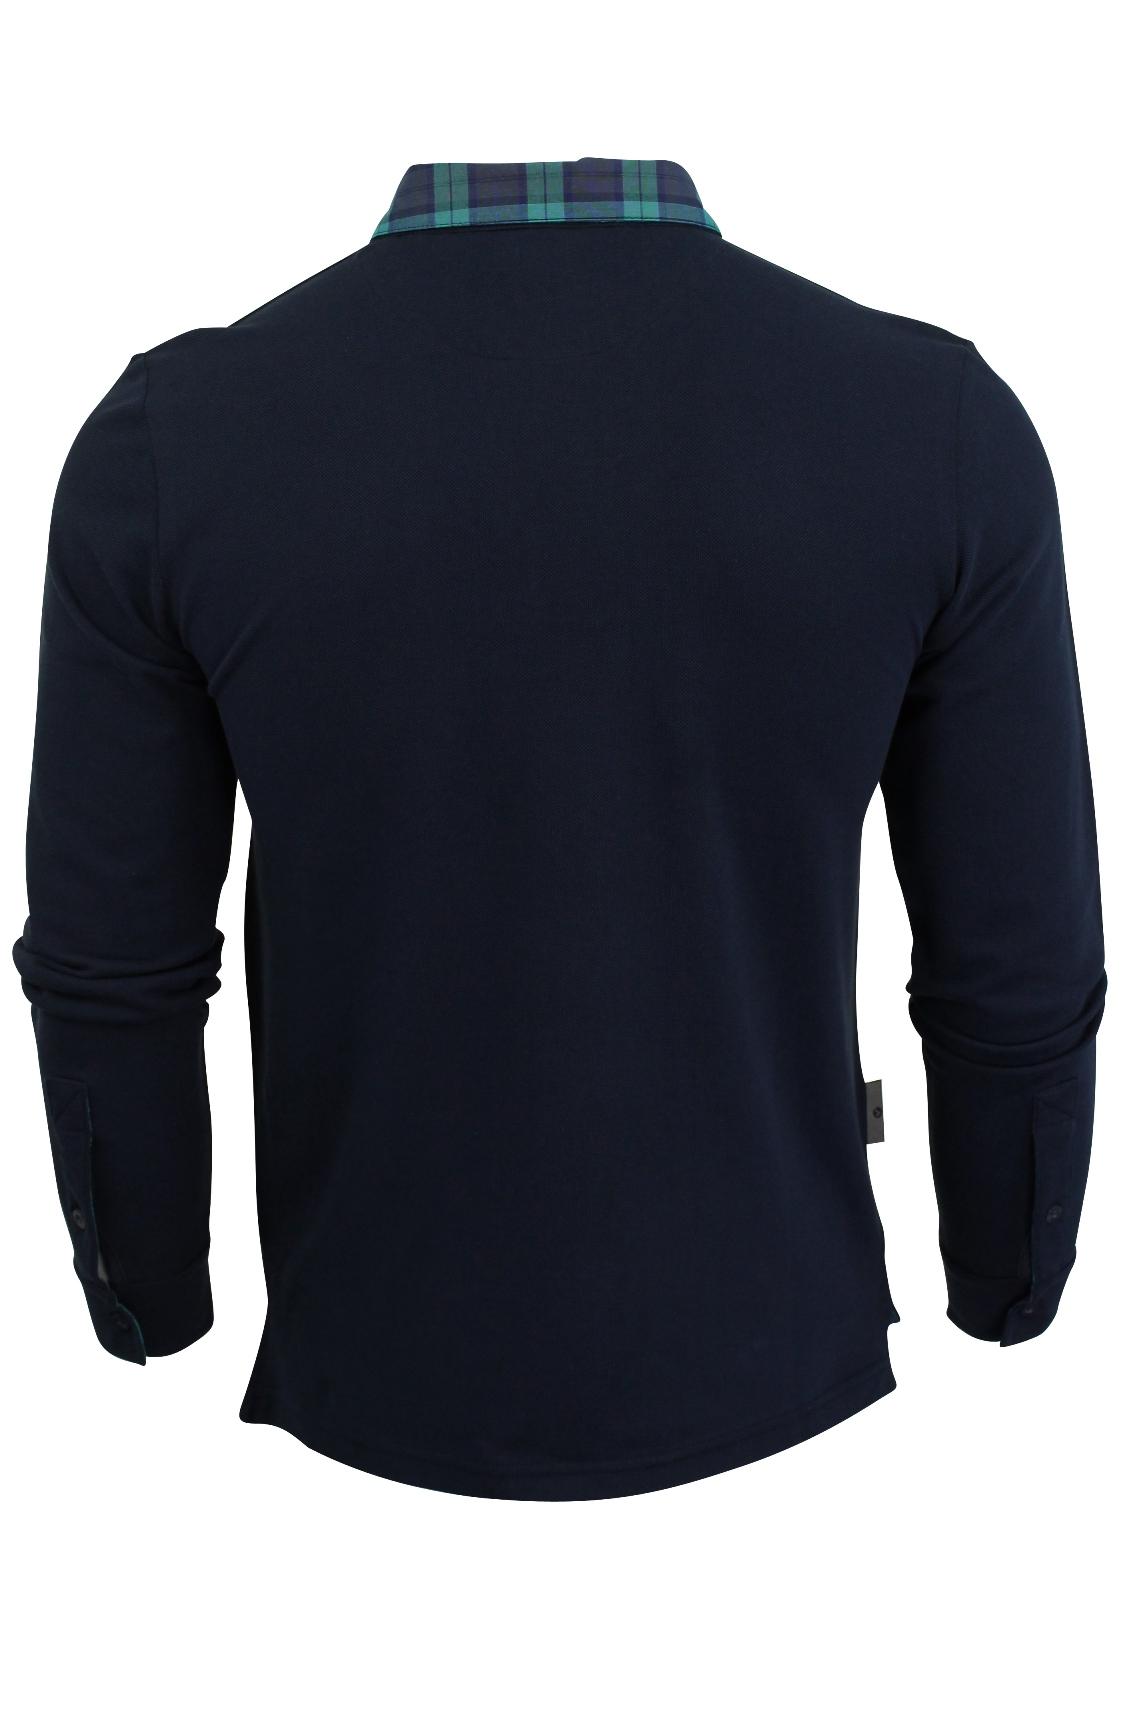 Camisa-Polo-para-hombre-por-Voi-Jeans-039-Rory-039-Manga-Larga miniatura 5